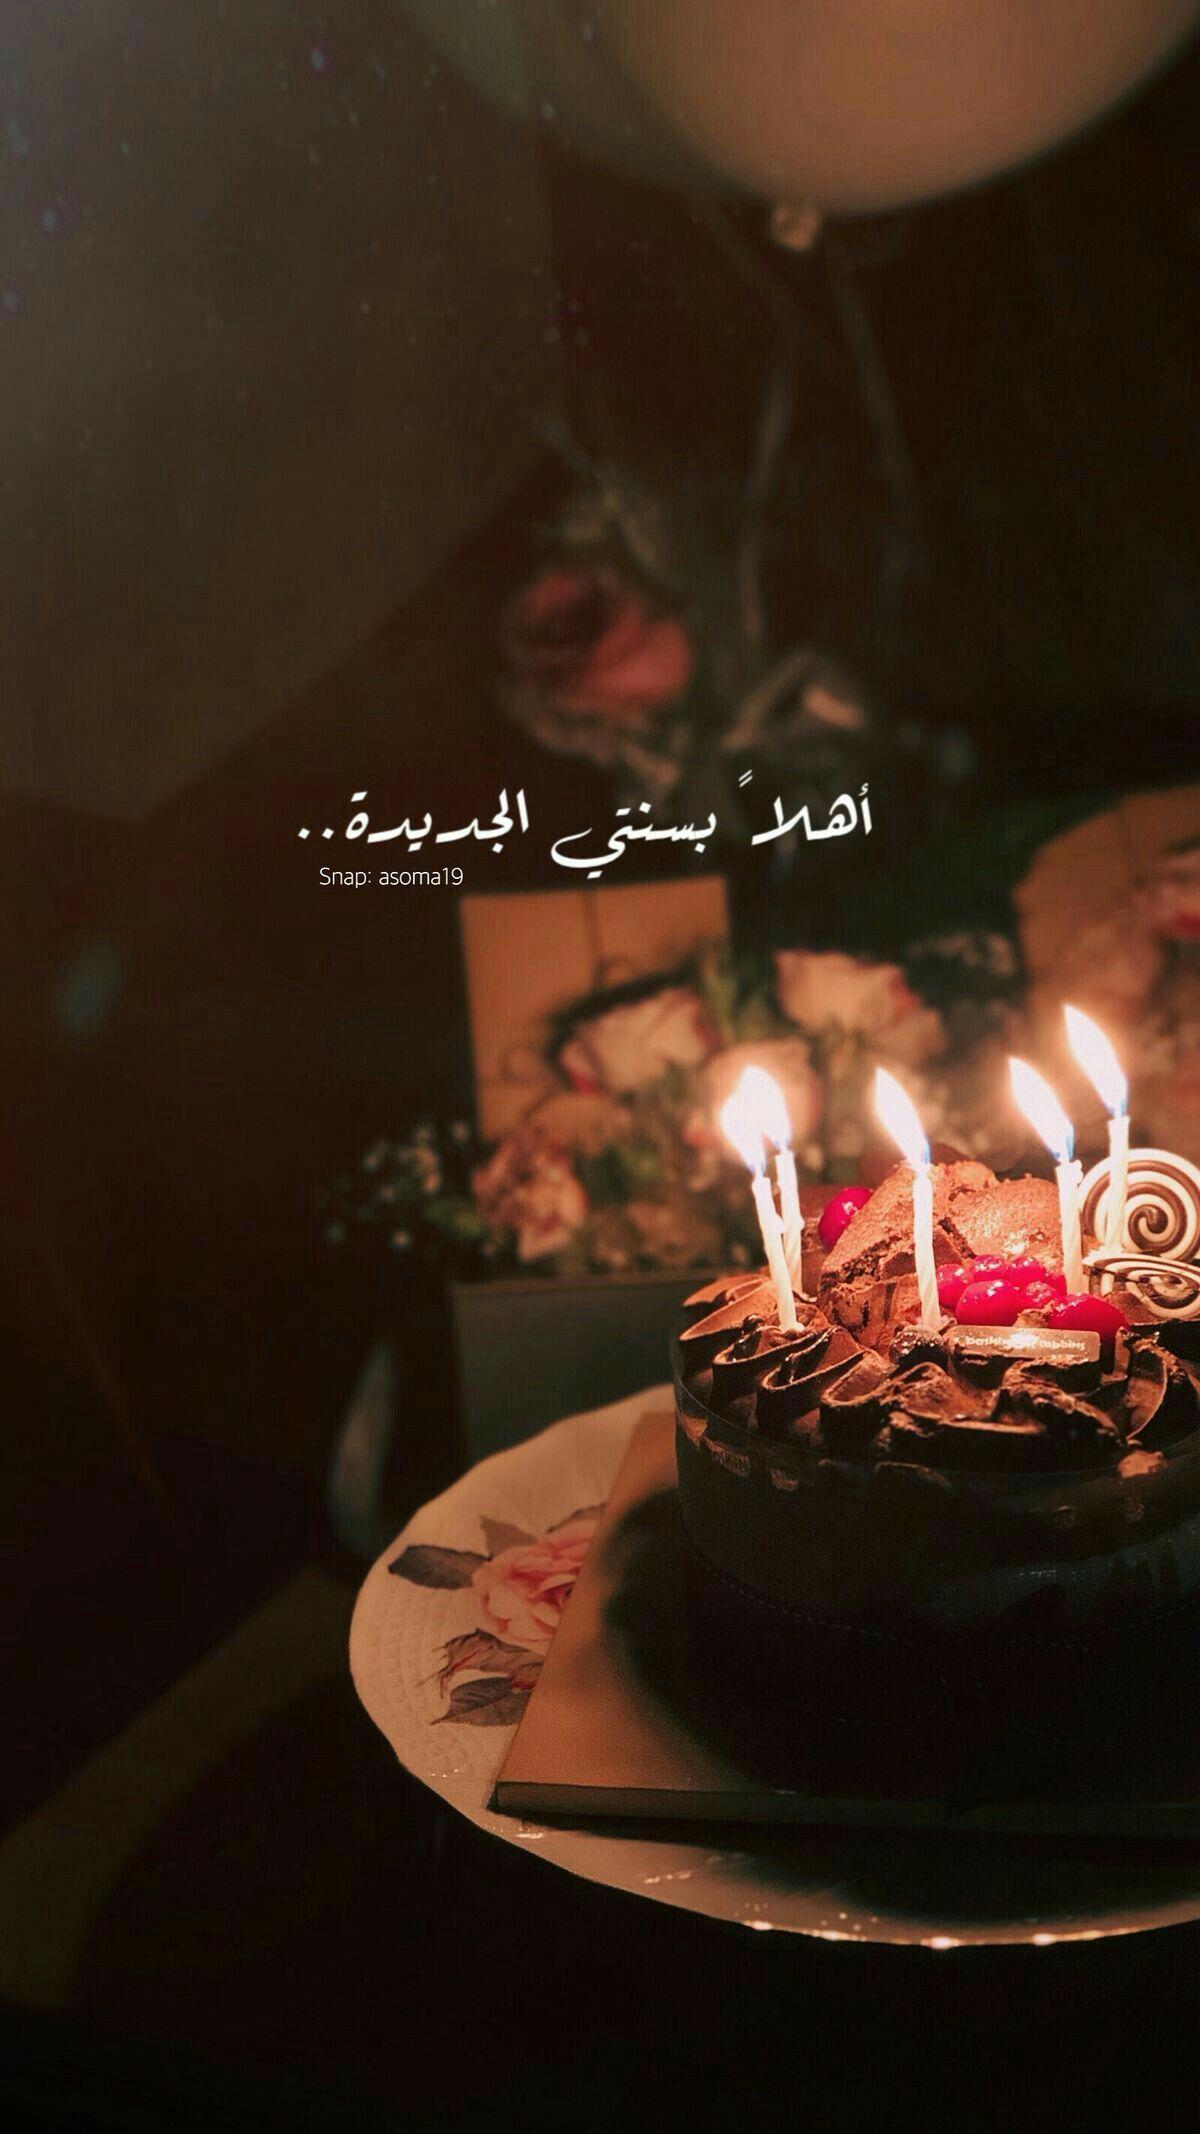 Pin By Marosh Marosh On عبارات لا تؤذي قلبا ولن ترى منها إلا الجميل Happy Birthday Quotes Happy Birthday To Me Quotes Birthday Girl Quotes